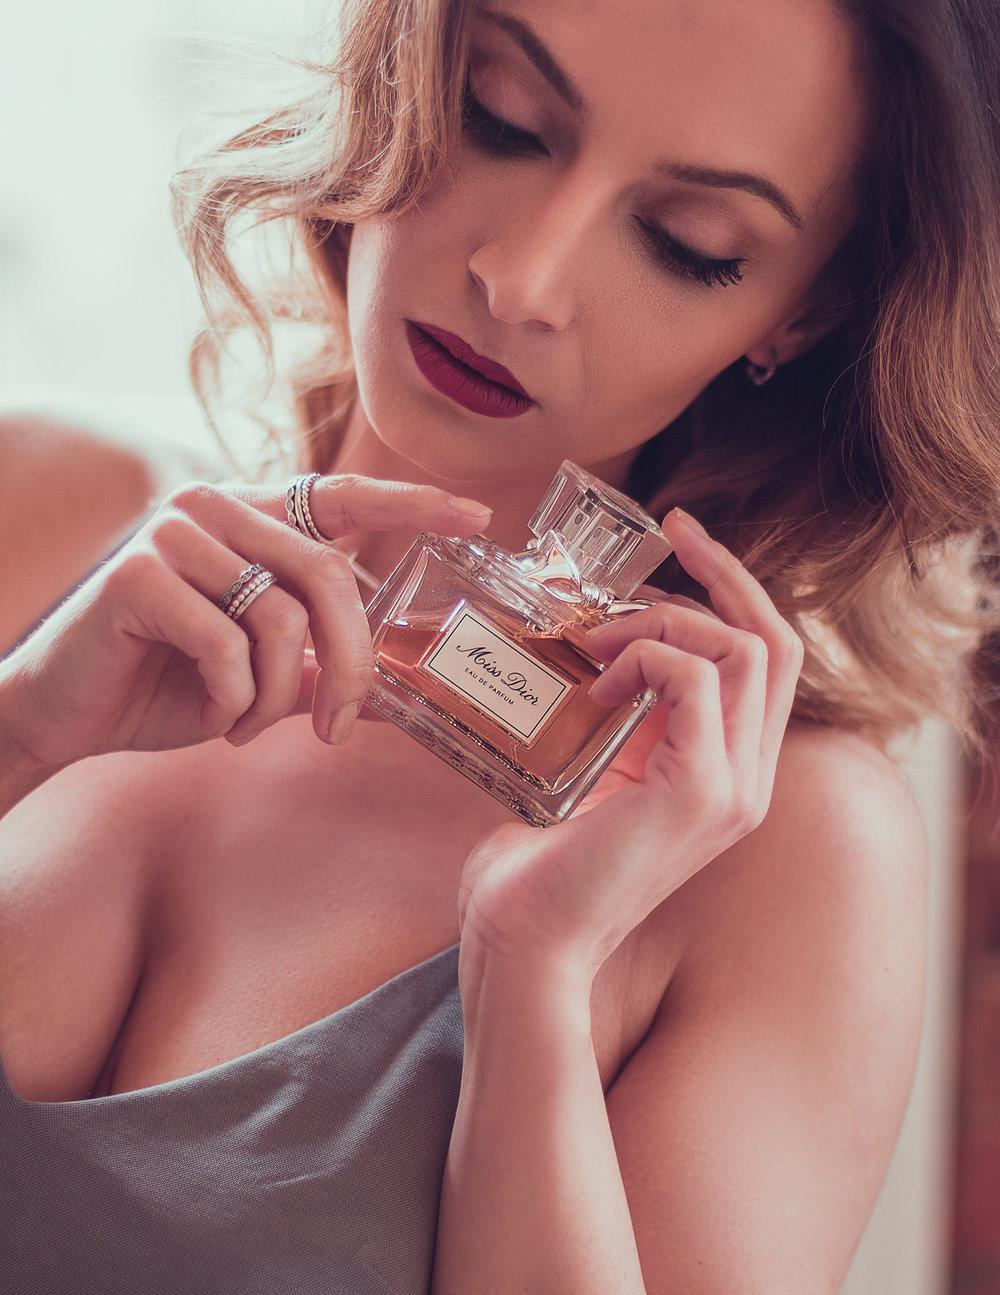 Secret-scent_by-Vera-Change_WEB_3.jpg